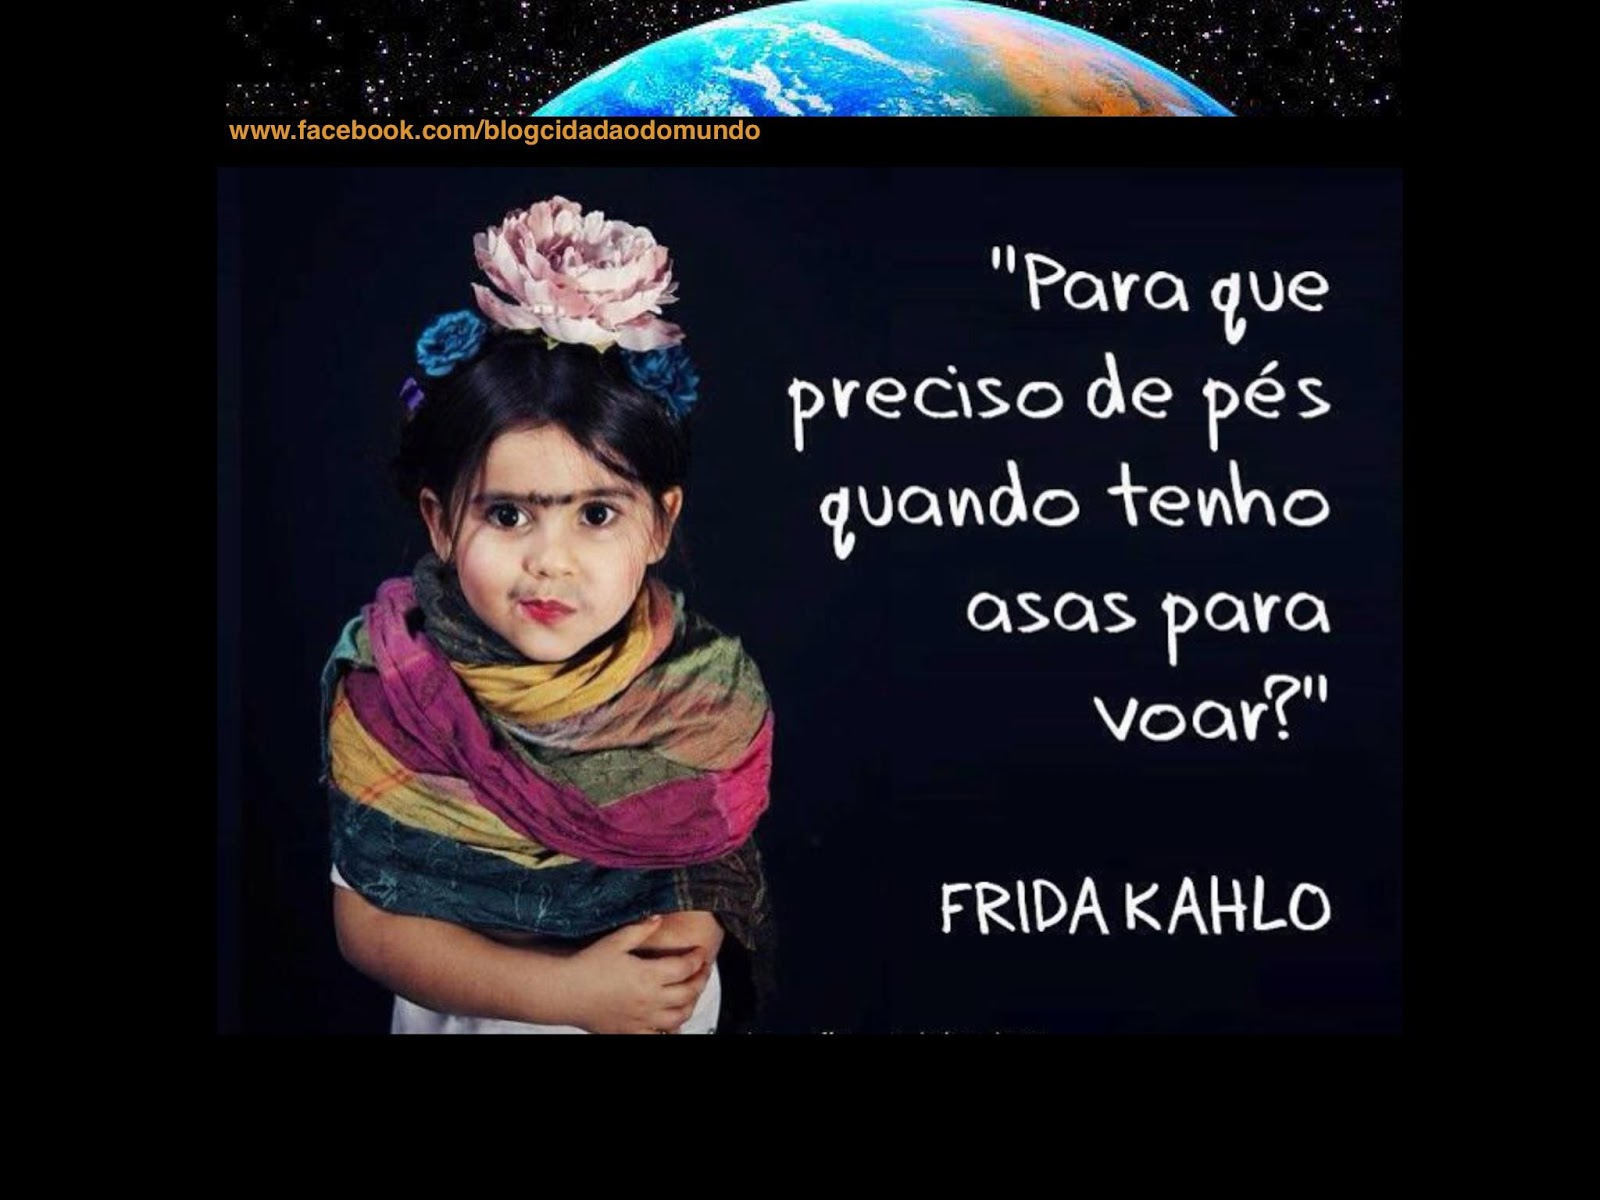 Poemário De Clevane Pessoa De Araújo Lopes Hana Haruko Frida Khalo